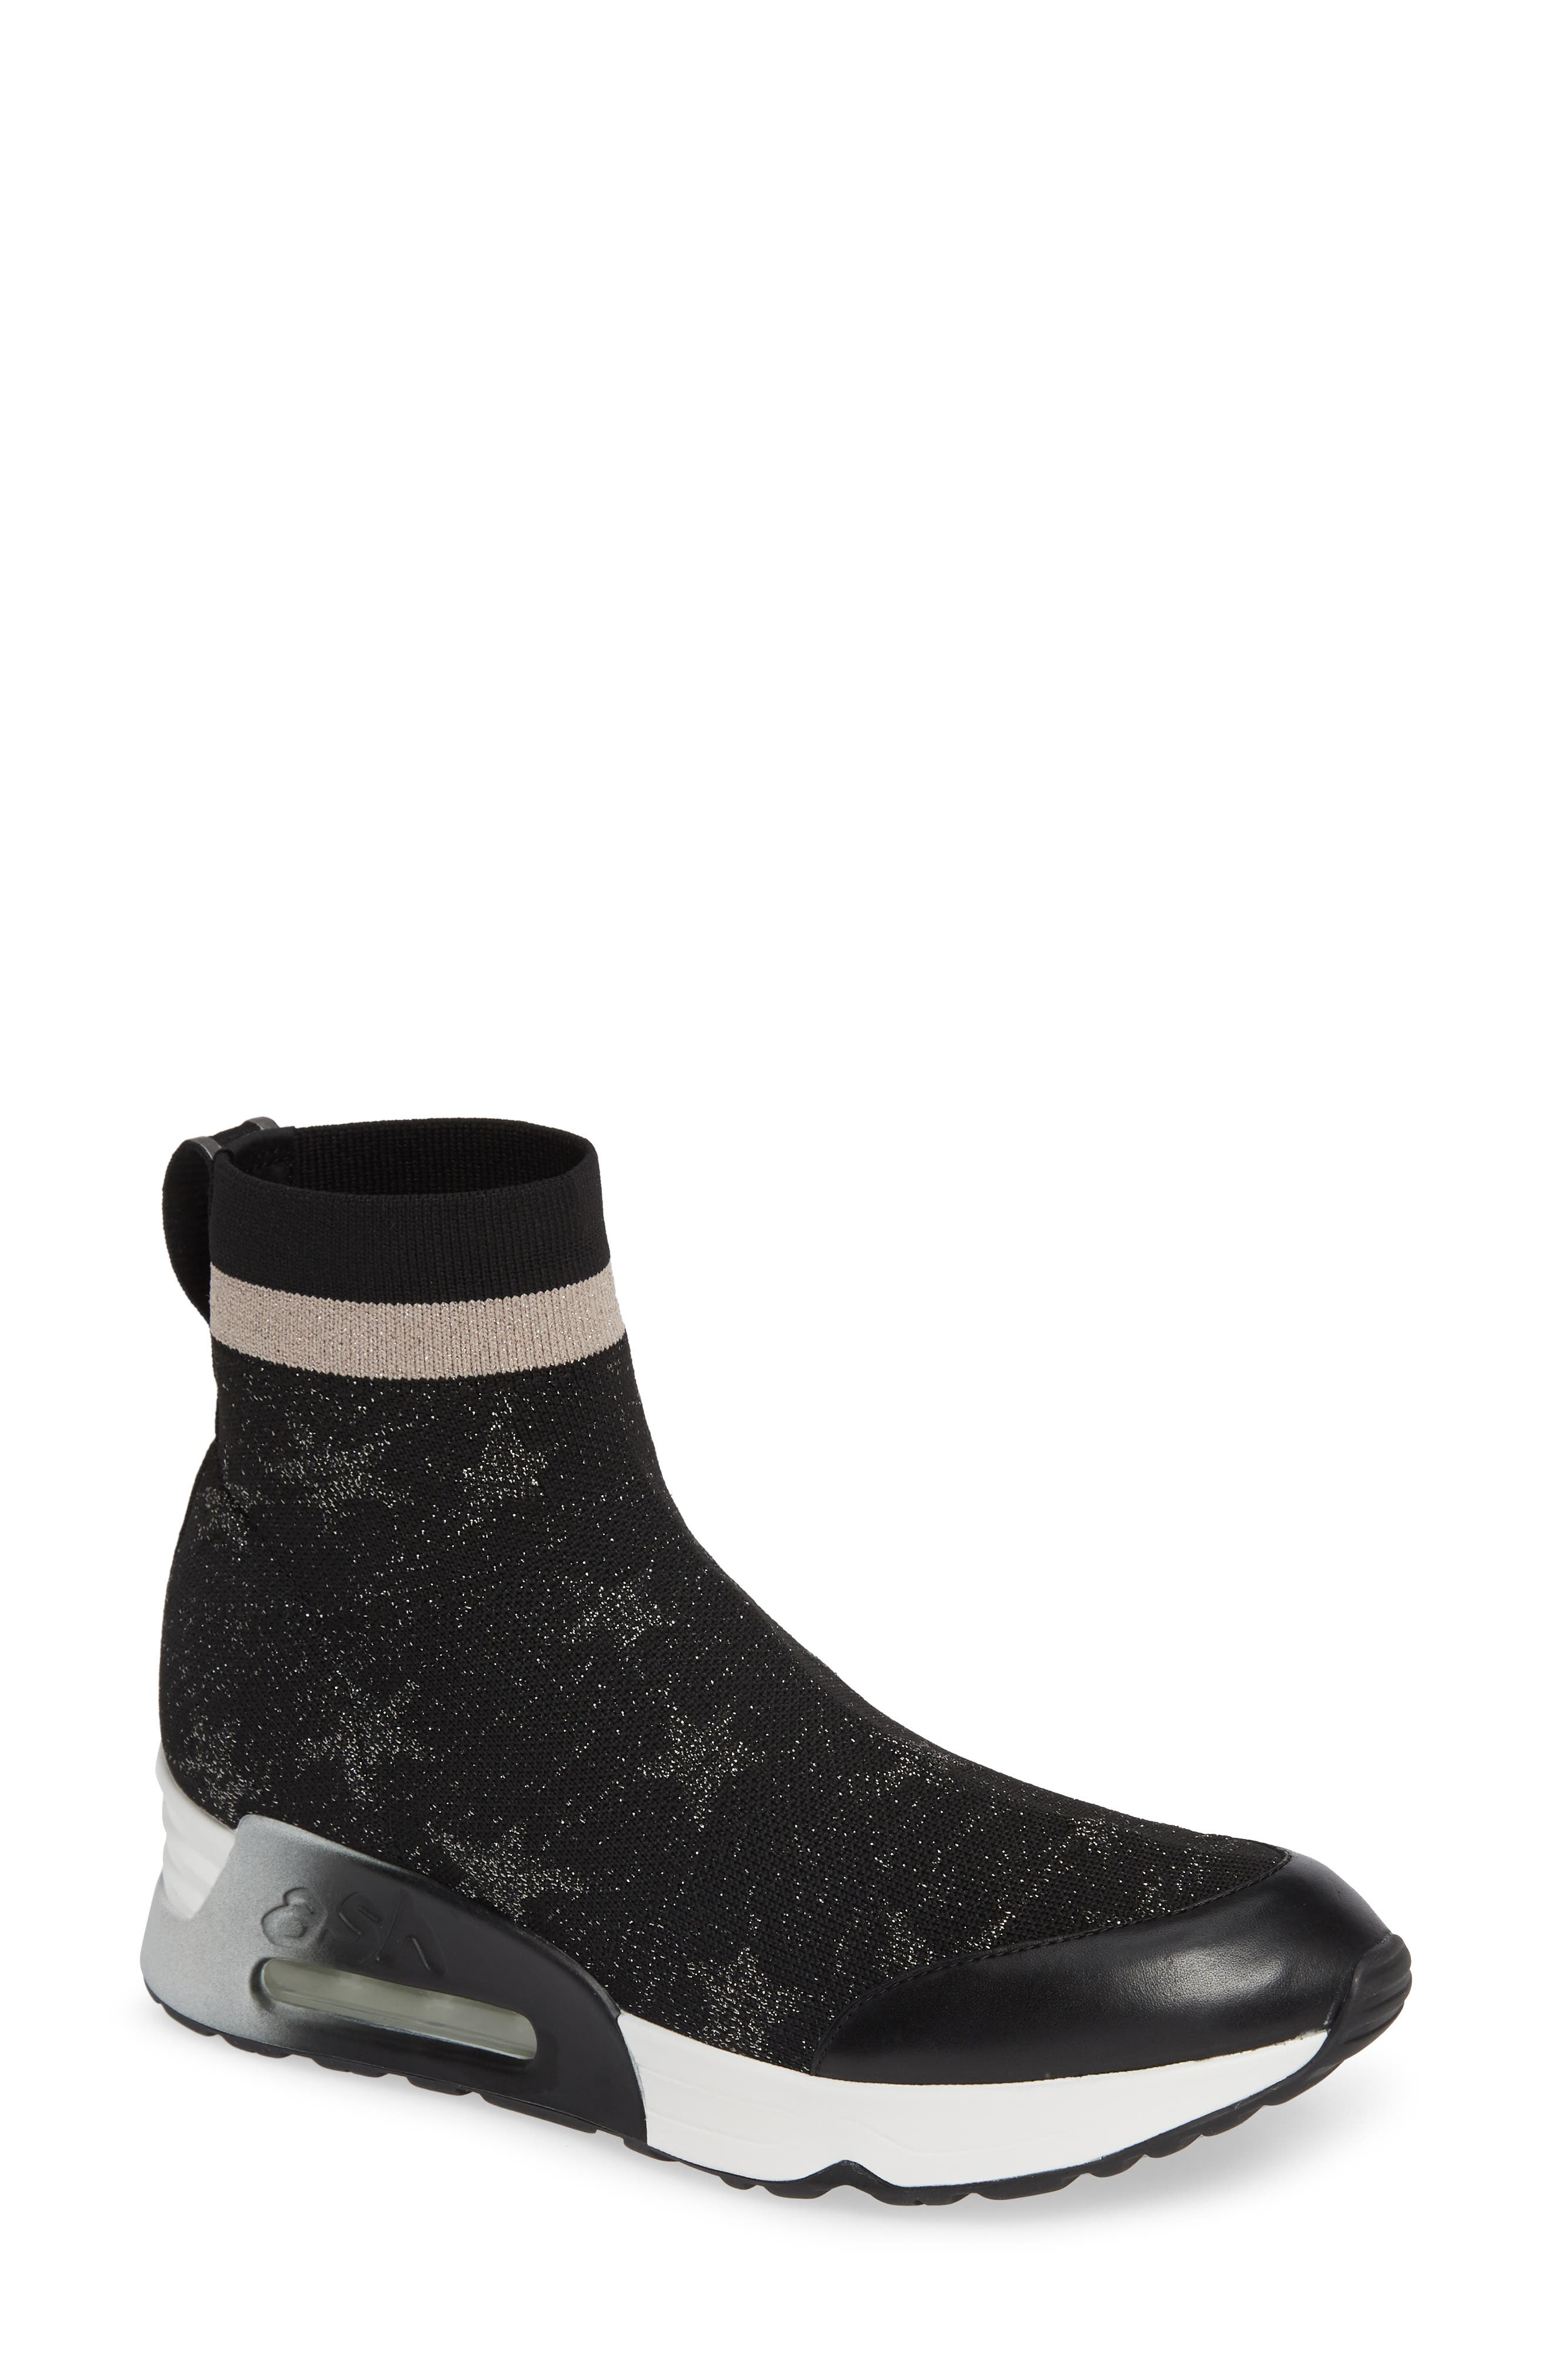 ASH Women'S Lulla Star Print Knit Platform Sneakers in Black/ Old Silver/ Black